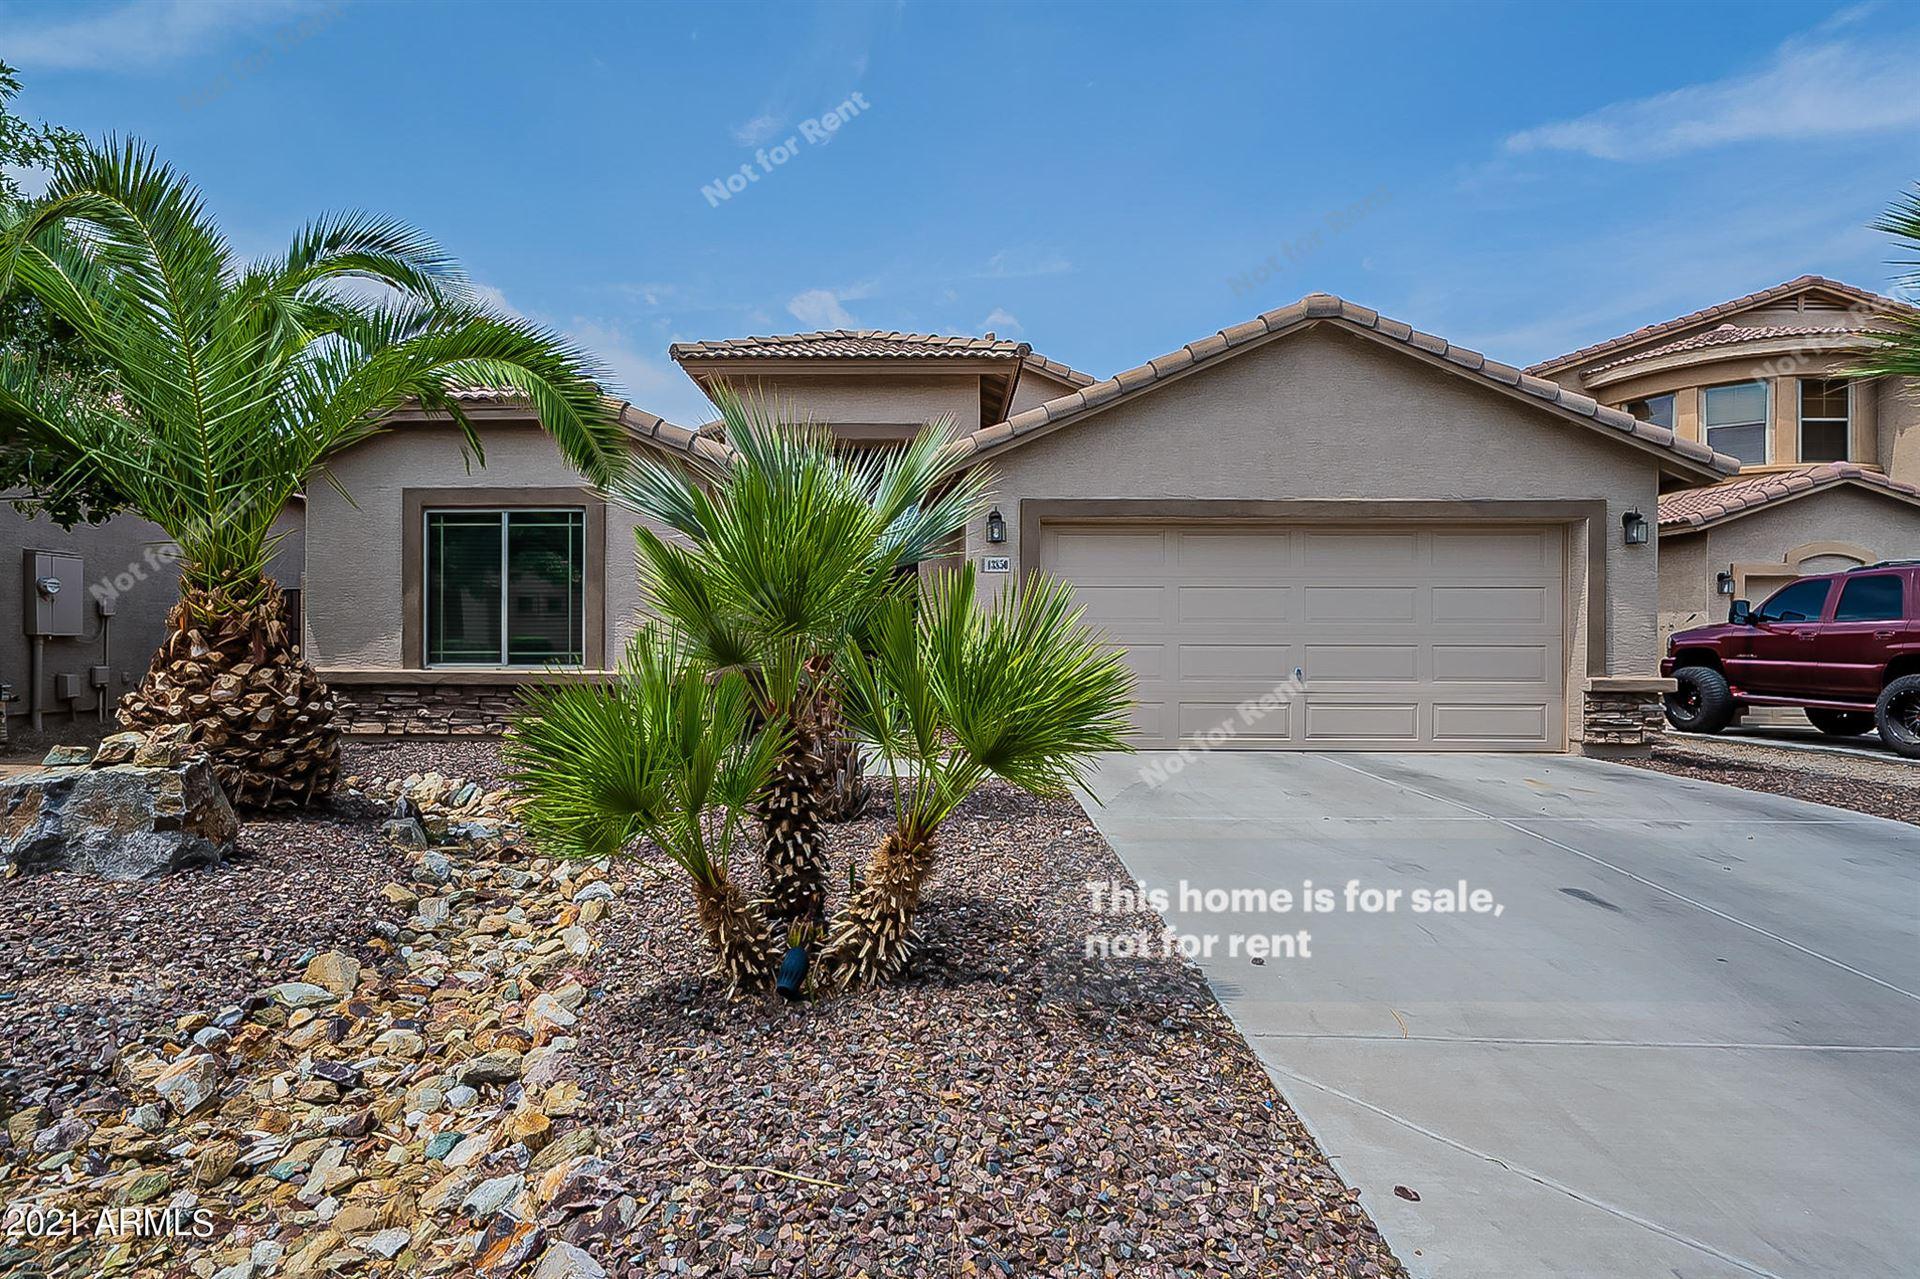 Photo for 43850 W KRAMER Lane, Maricopa, AZ 85138 (MLS # 6266063)